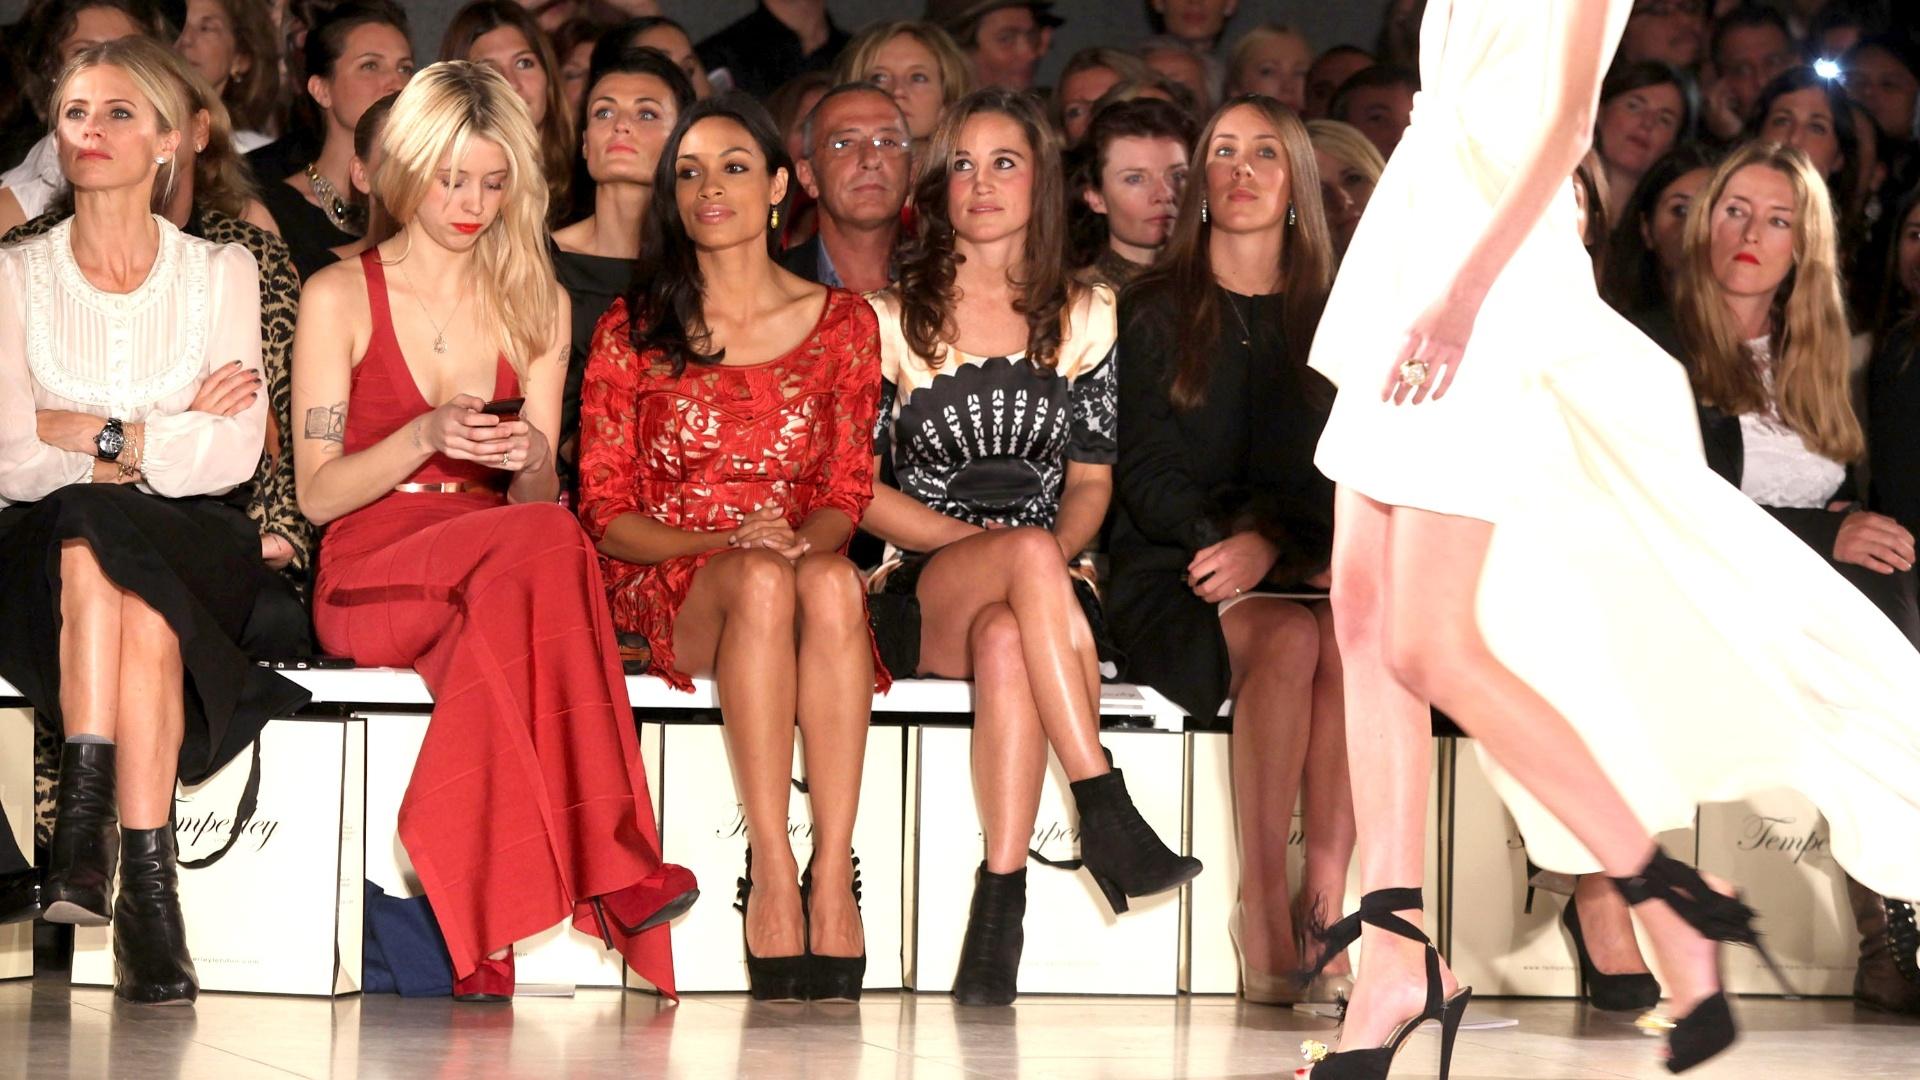 Pippa Middleton, Peaches Geldof e a atriz Rosario Dawson assistem ao desfile da Temperley na London Fashion Week (19/09/2011)